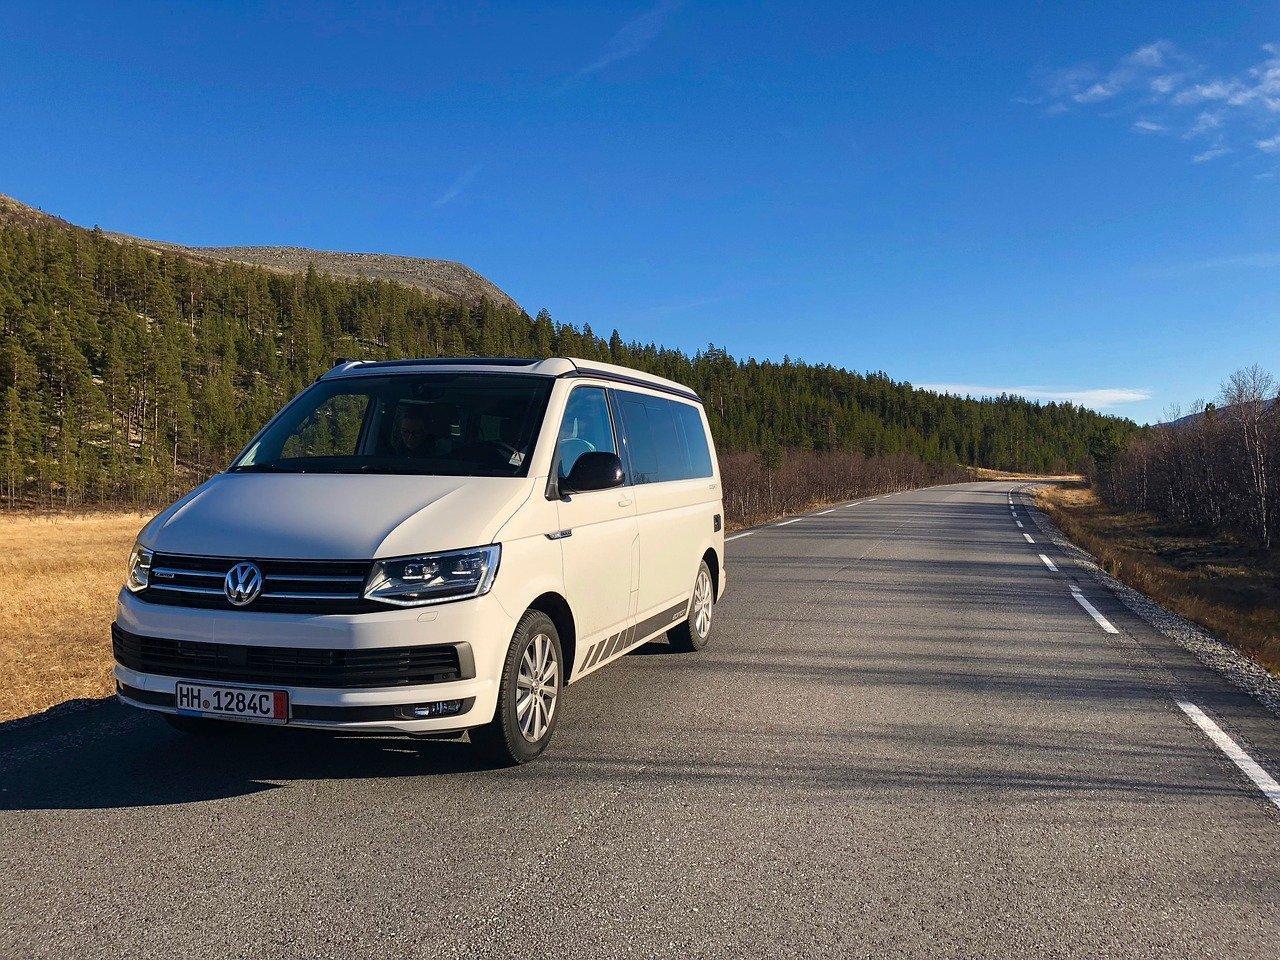 Volkswagen Bulli Vehicle - Free photo on Pixabay